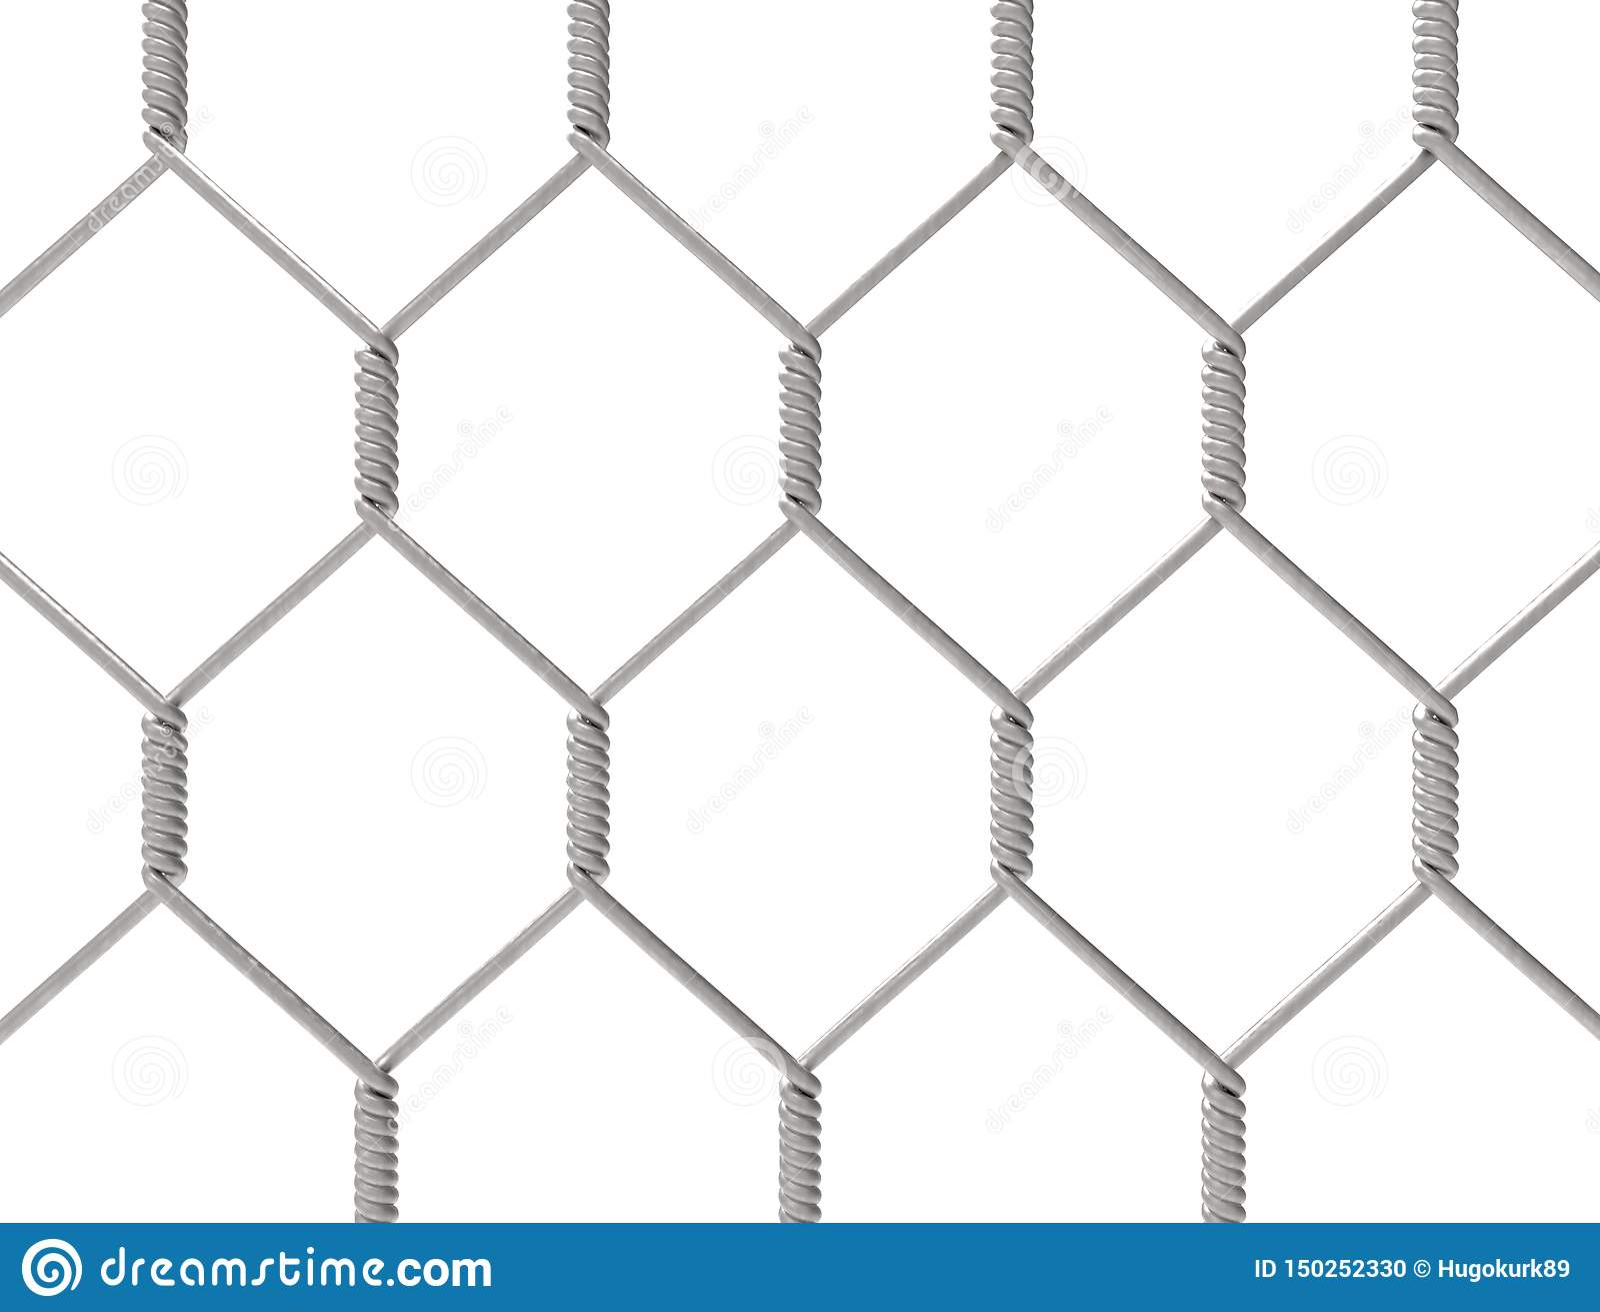 Tolkning 3d av ett metallstaket som isoleras på vit bakgrund